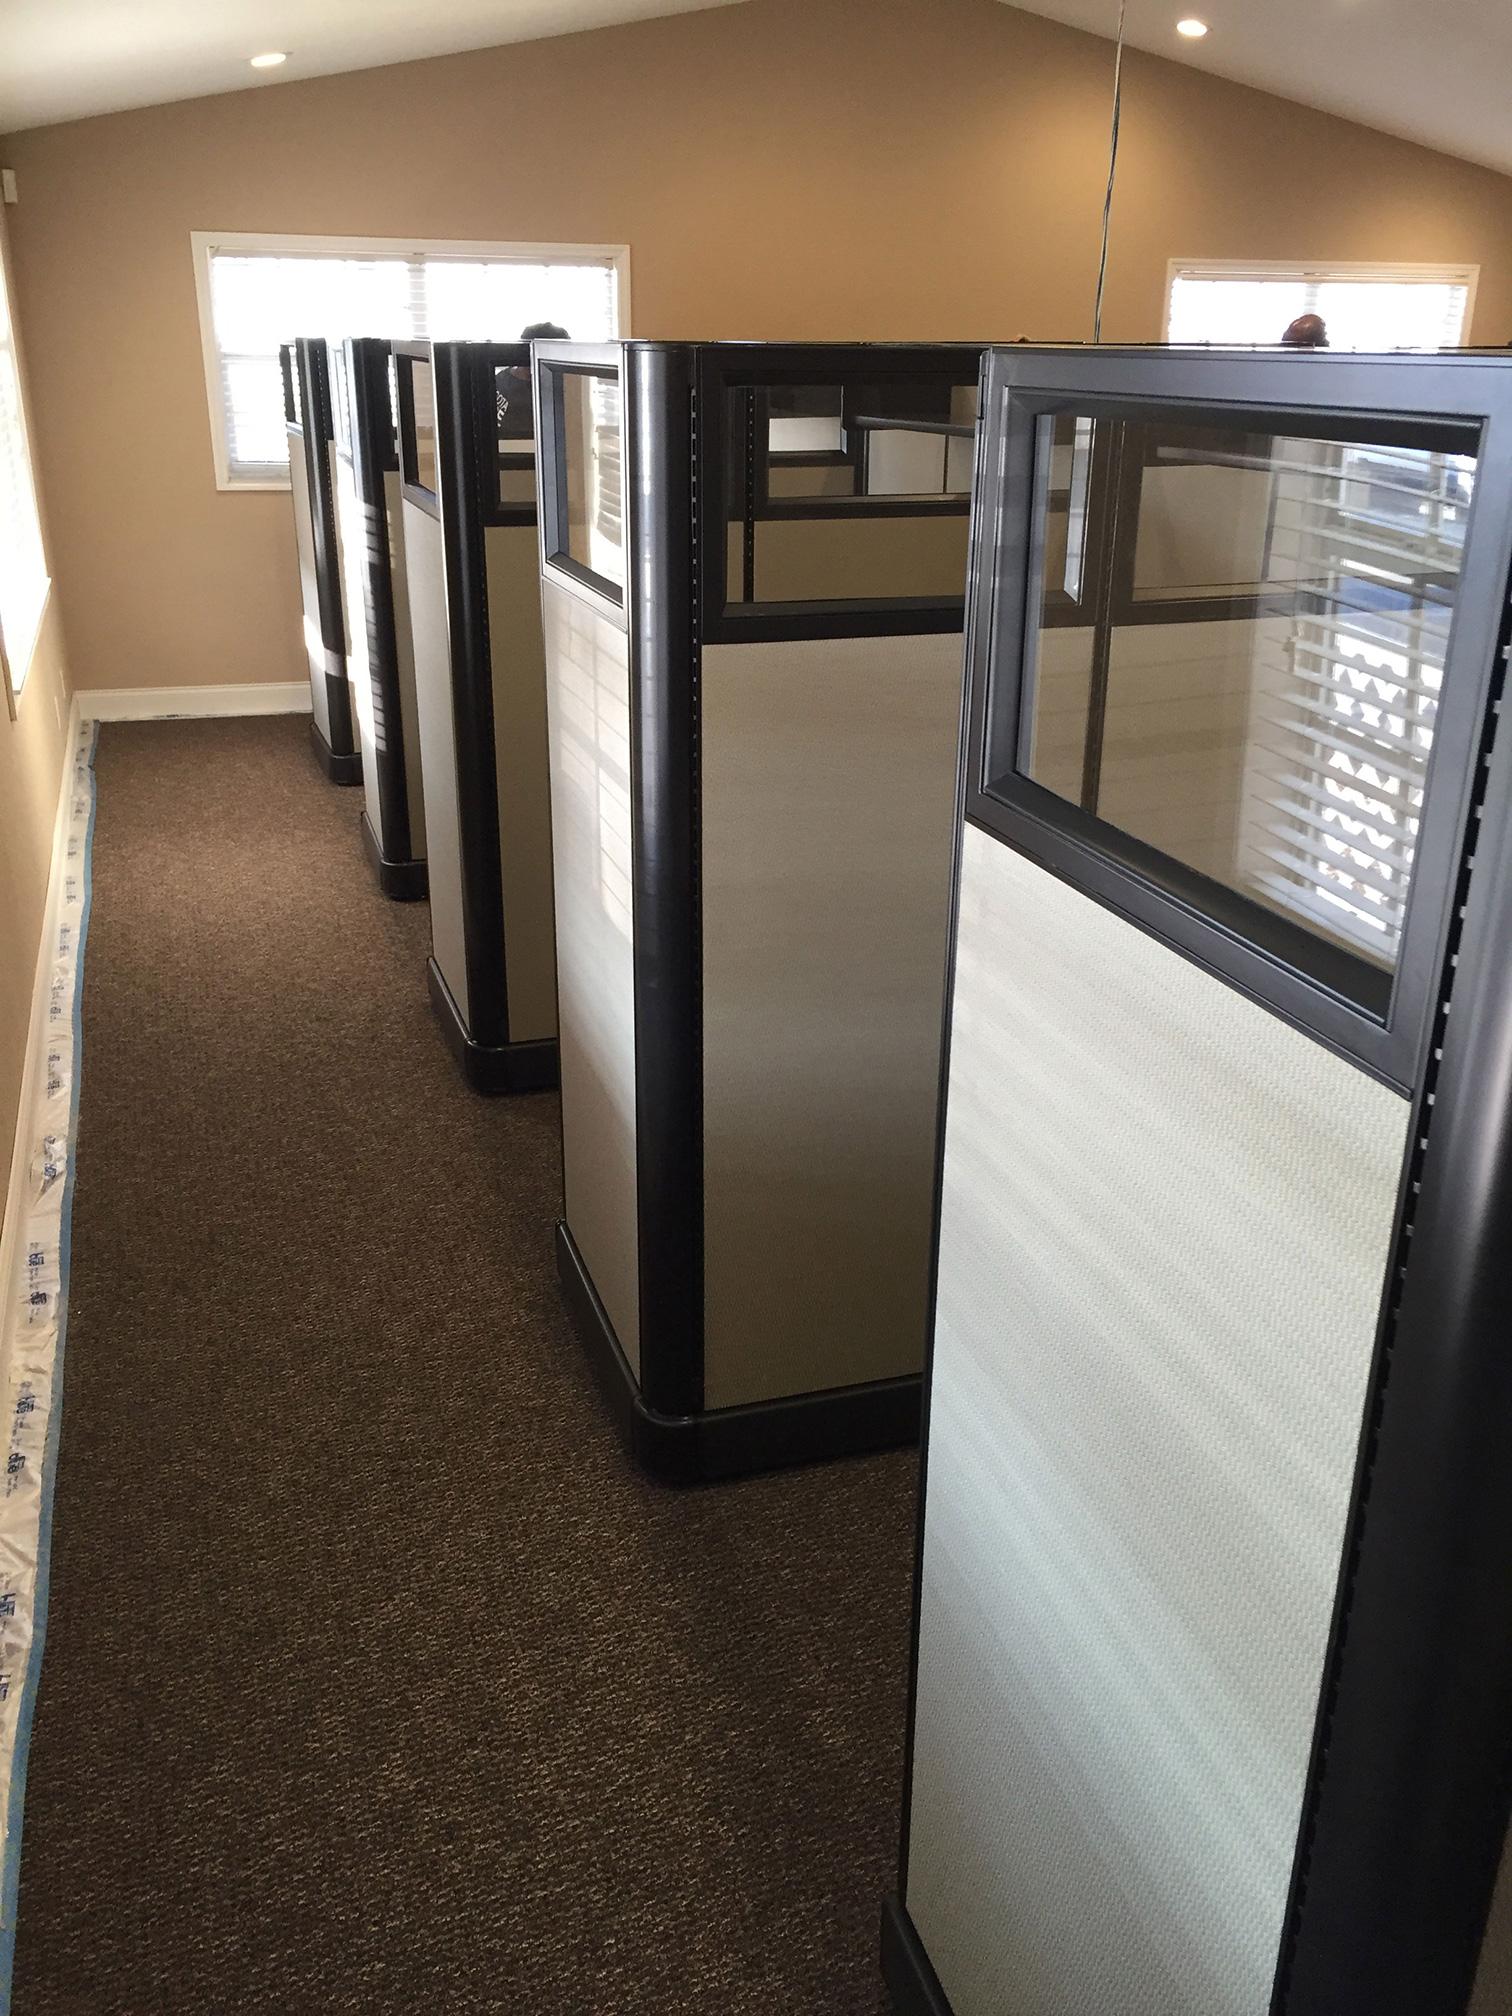 office-cubicles-for-sale-in-sanibel-florida-3.jpg